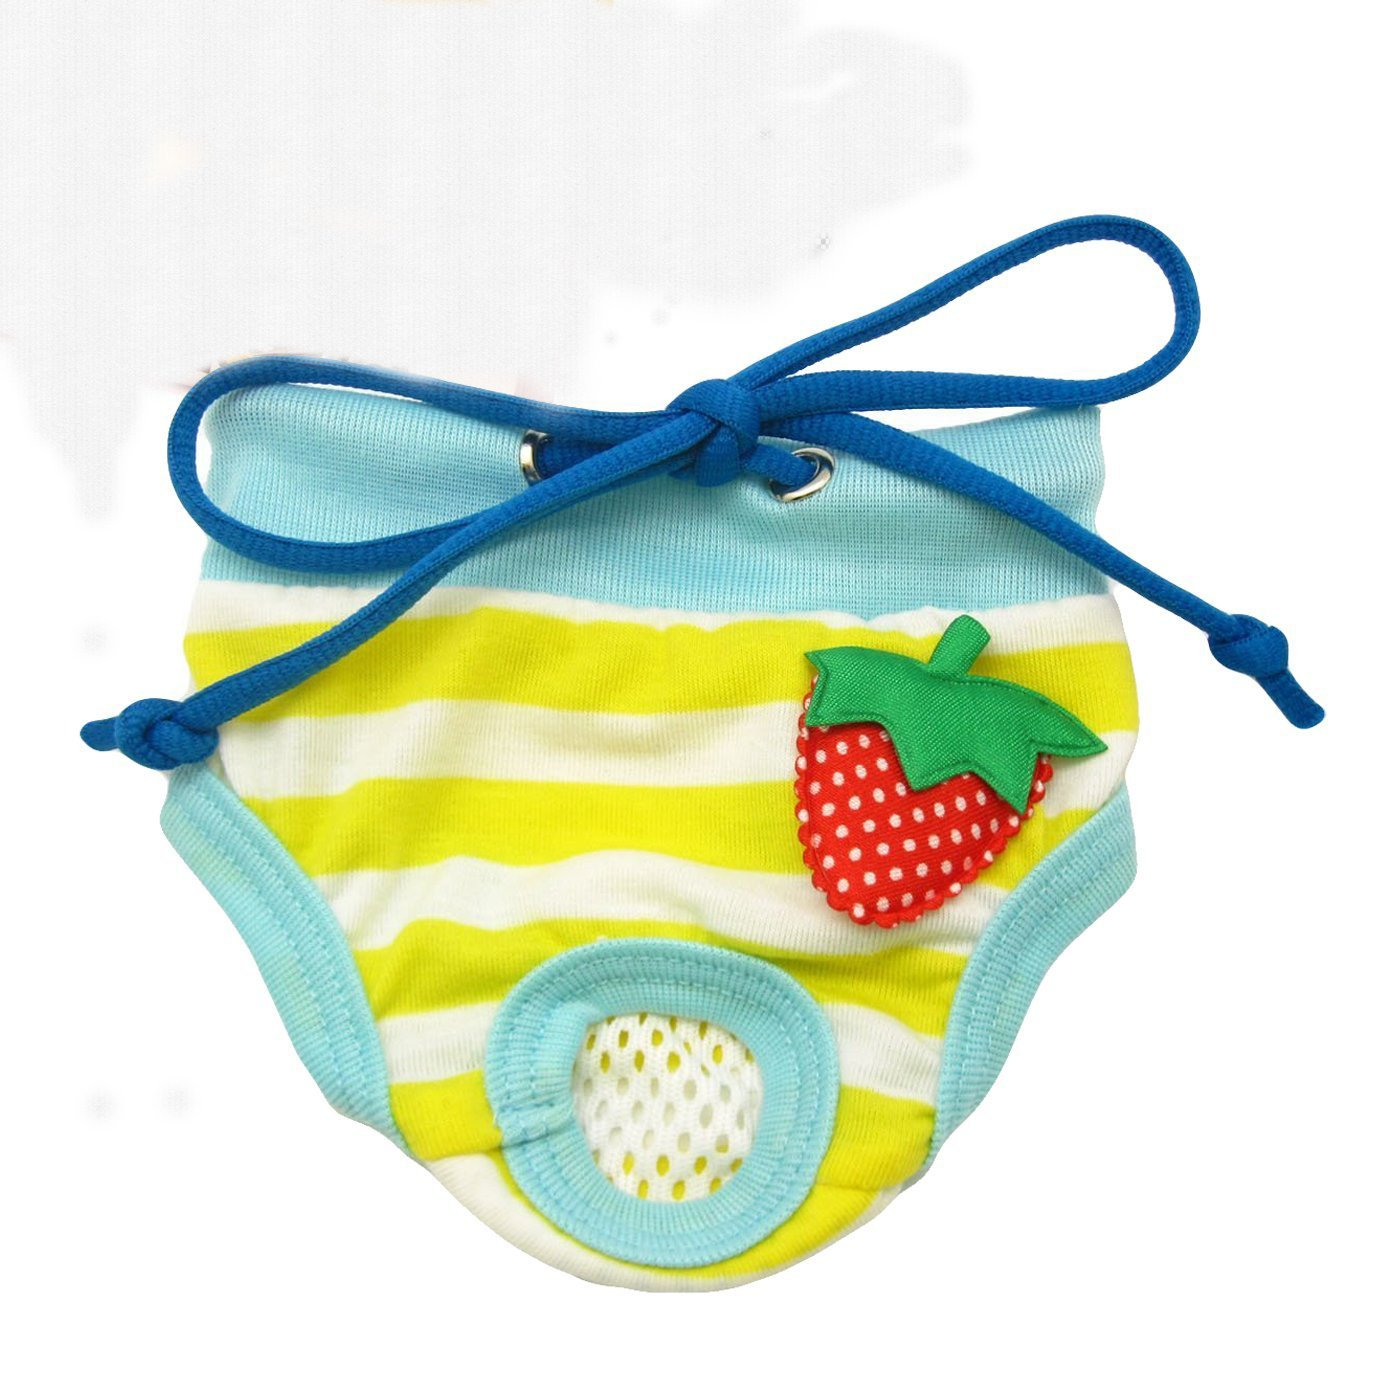 Mimibox Strawberry Pet Puppy Underwear Dog Physiological Panty Diaper Sanitary Panties Female